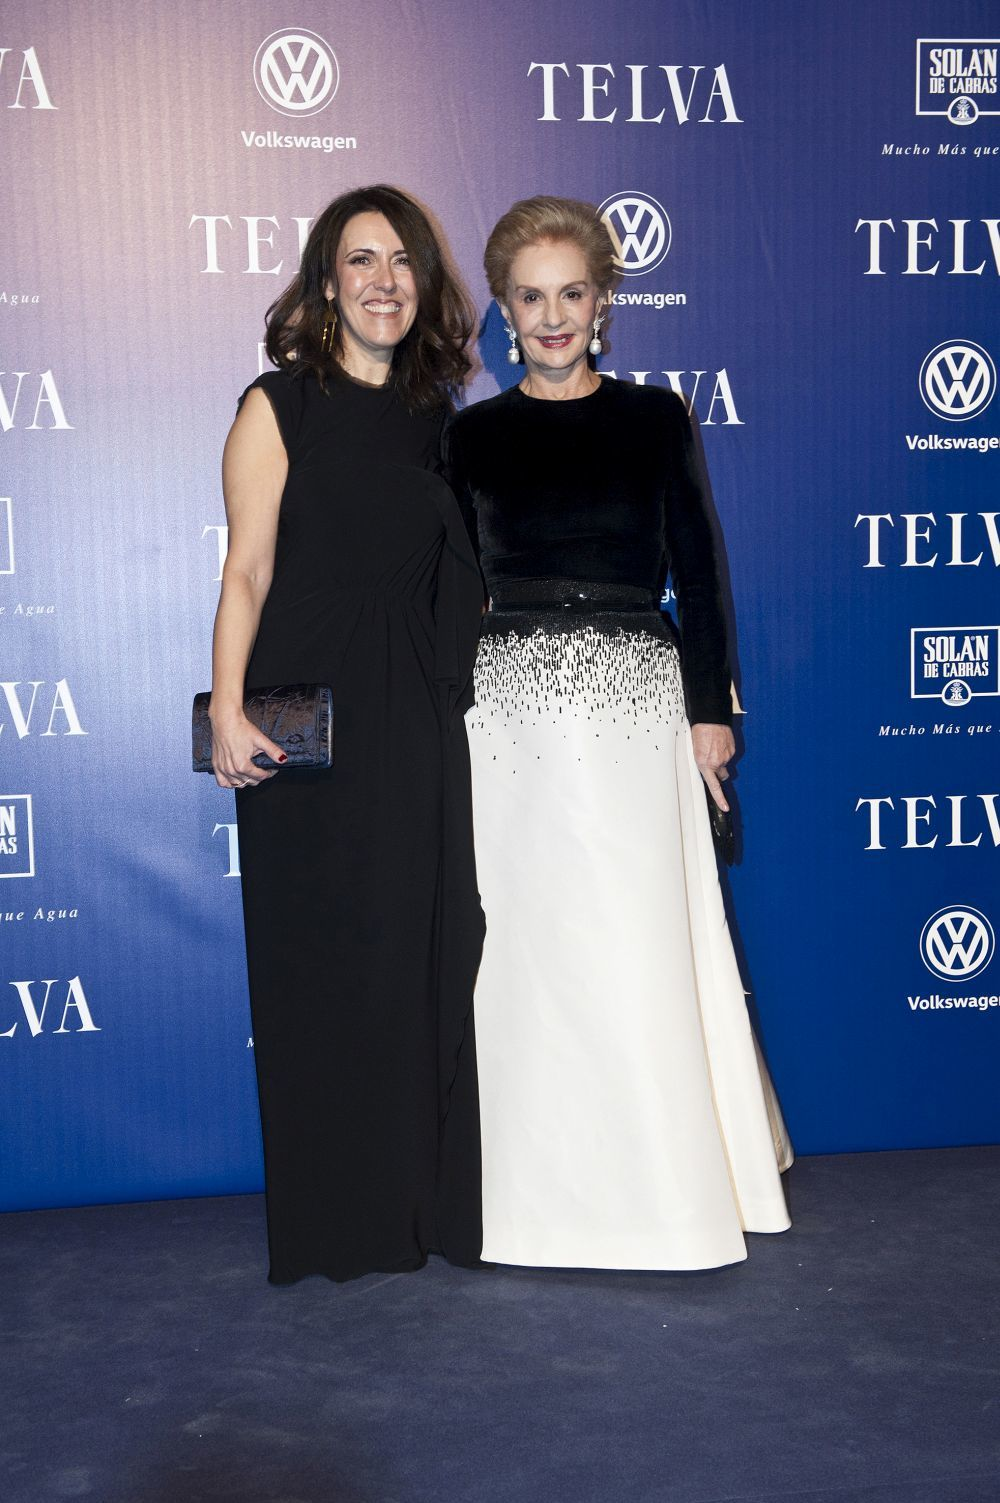 Carolina Herrera junto a Olga Ruiz, directora de TELVA, tras recibir...